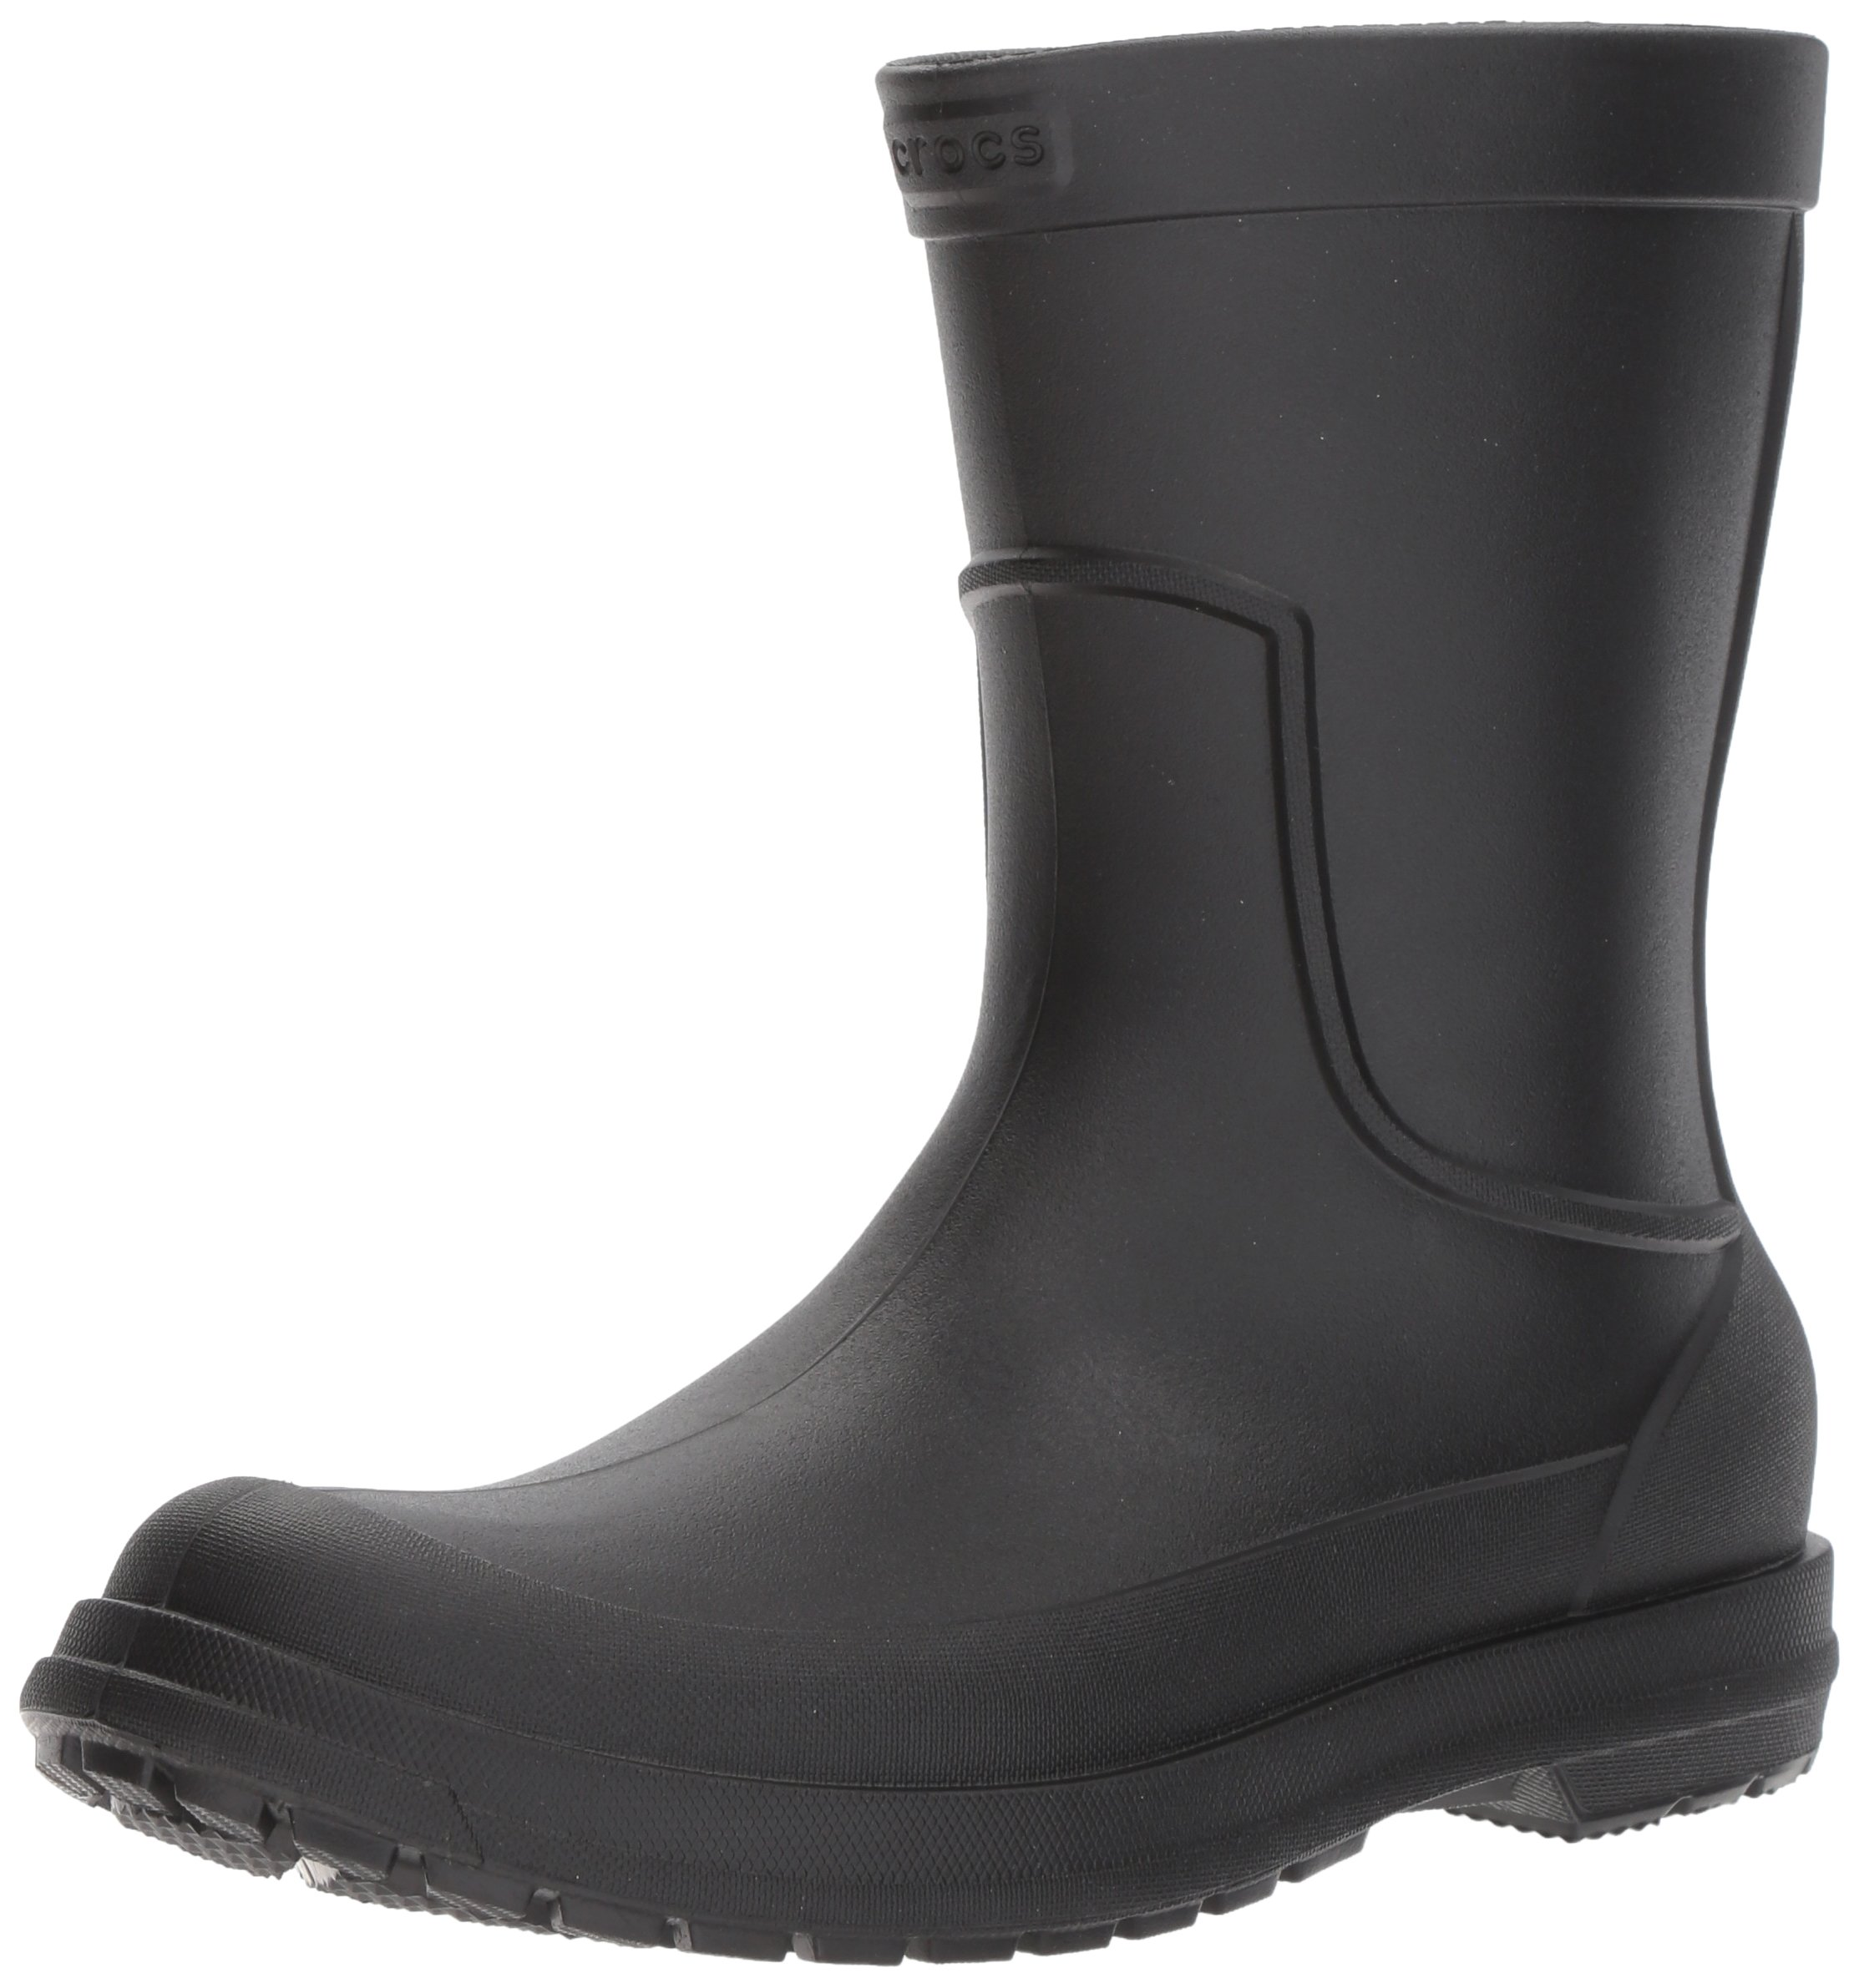 Crocs Men's AllCast M Rain Boot, Black/Black, 13 M US